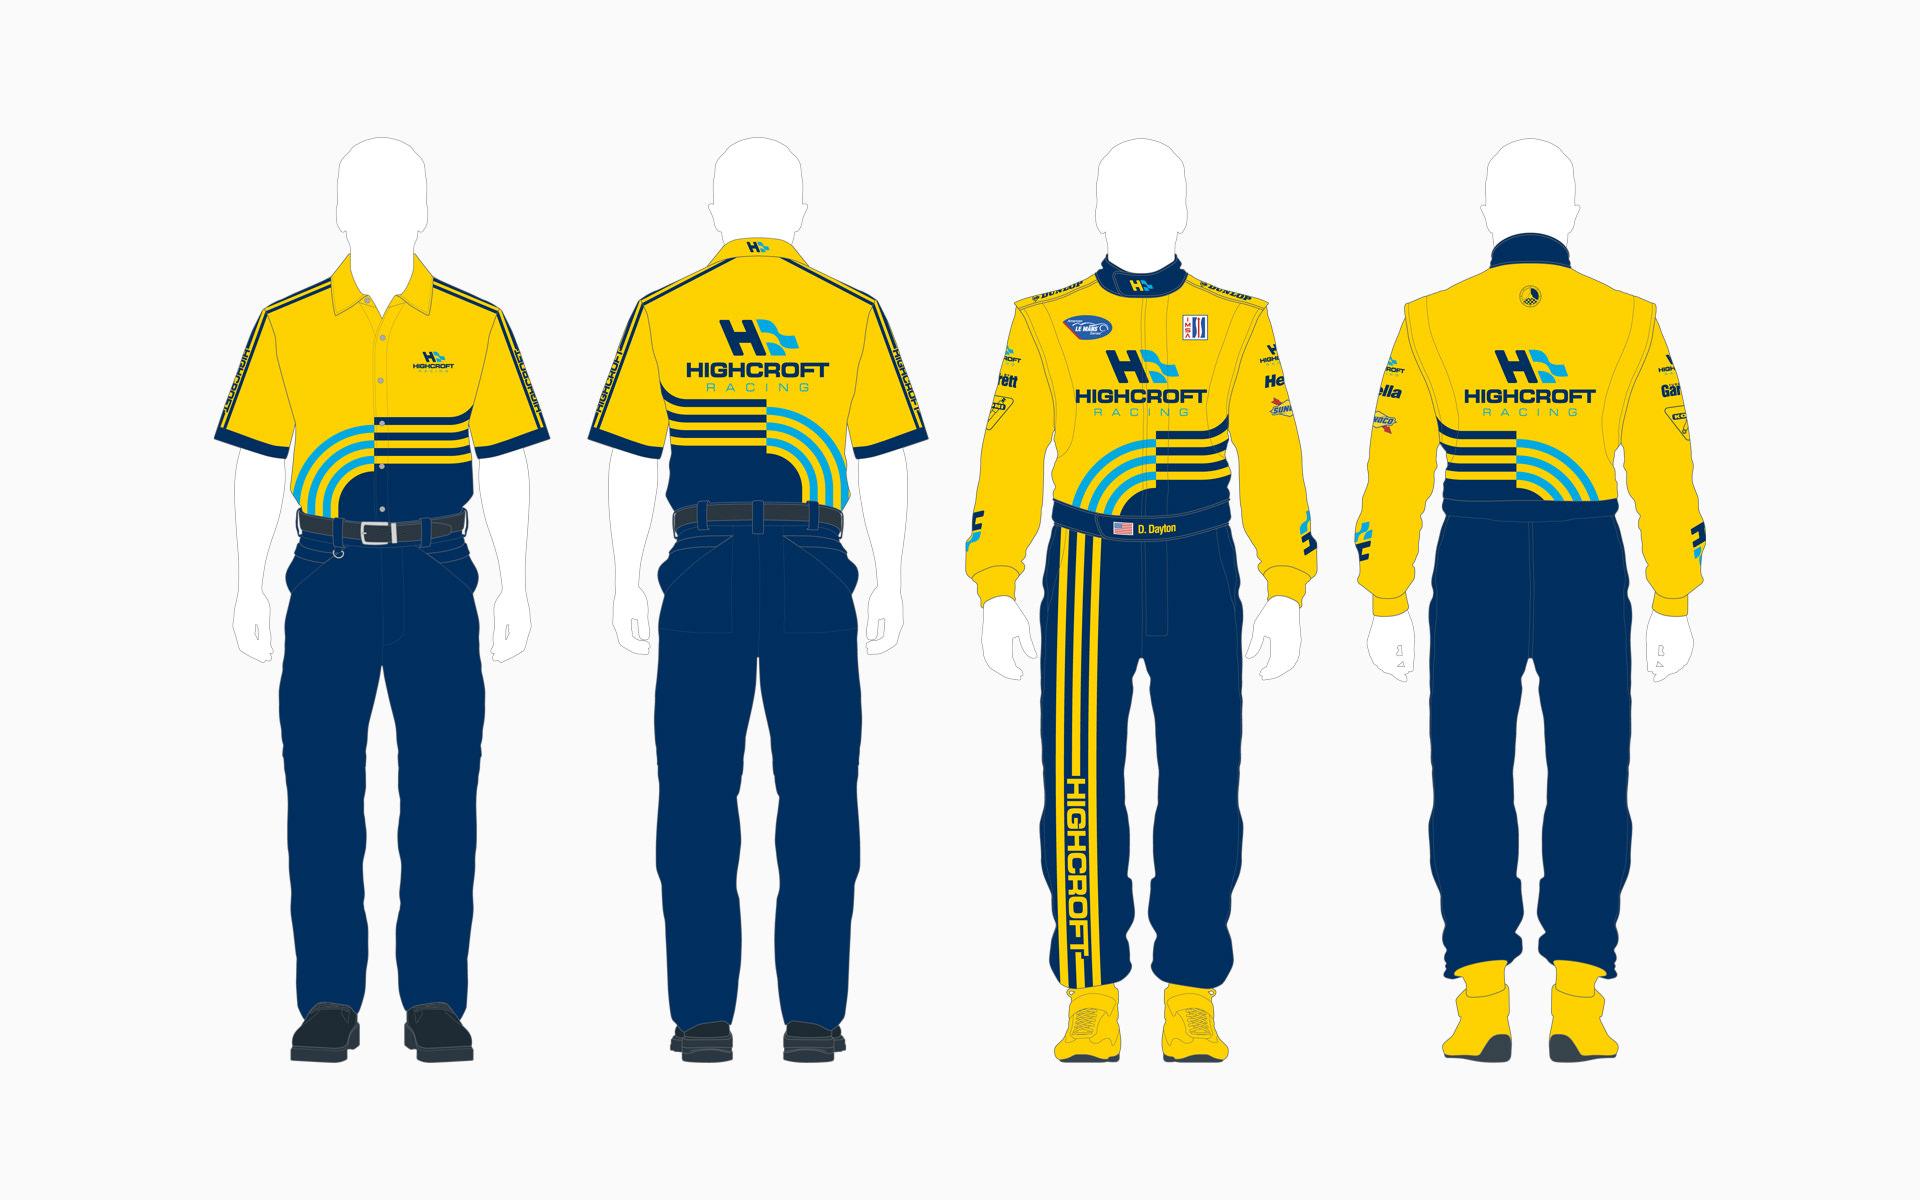 2006 Highcroft Racing Crew Shirt and Firesuit